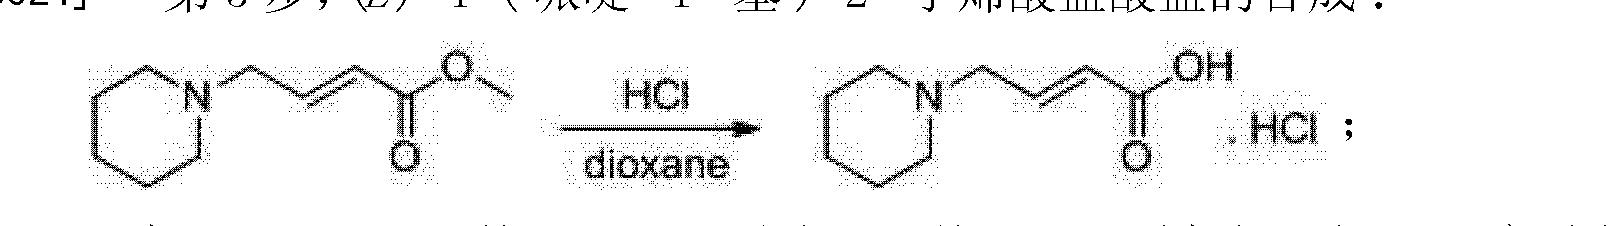 Figure CN103304492AD00105